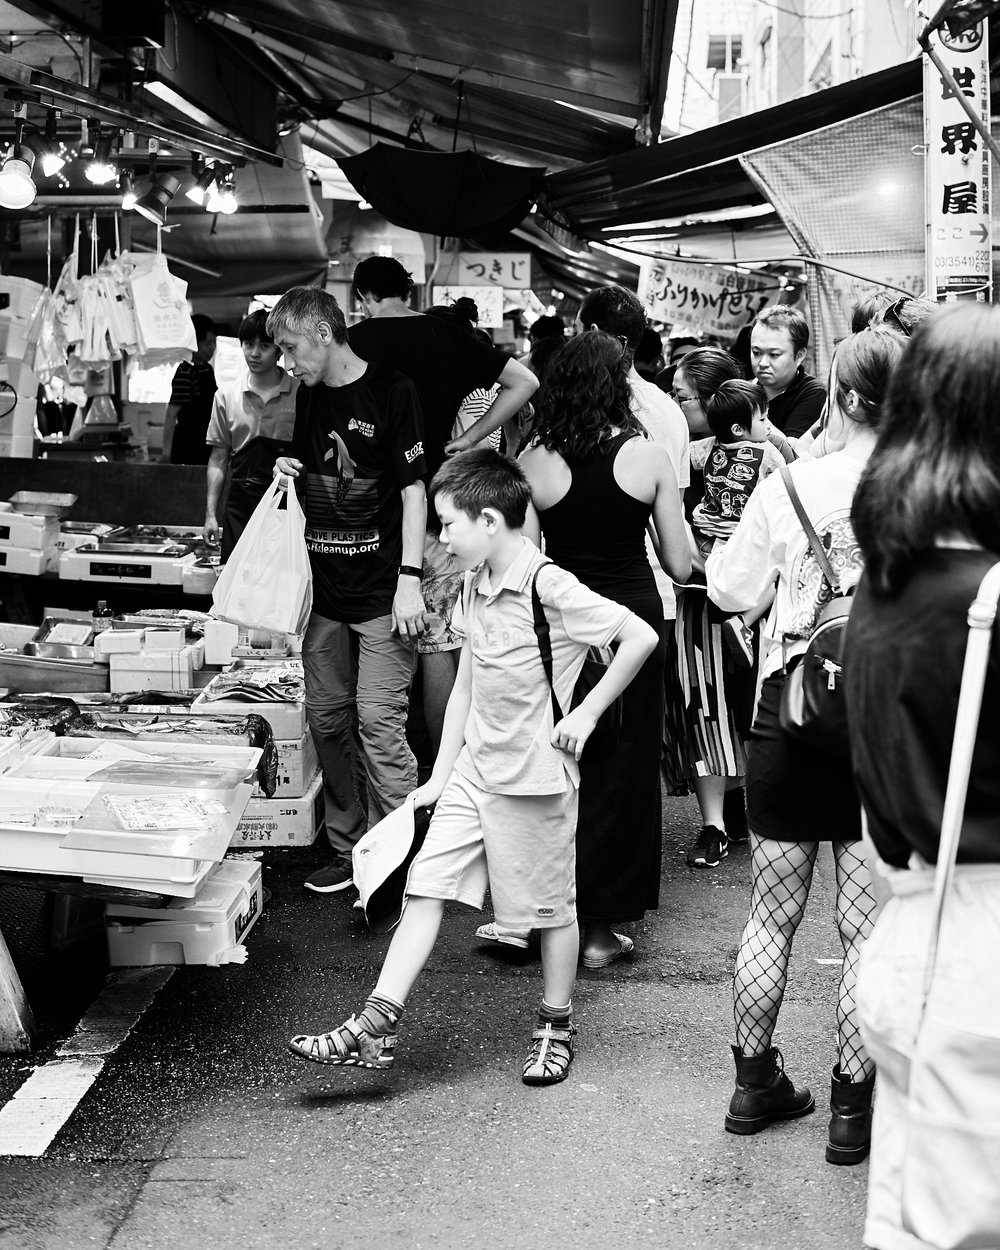 SnapPilots_17-07-05_Tokyo2017_bnw_53.jpg